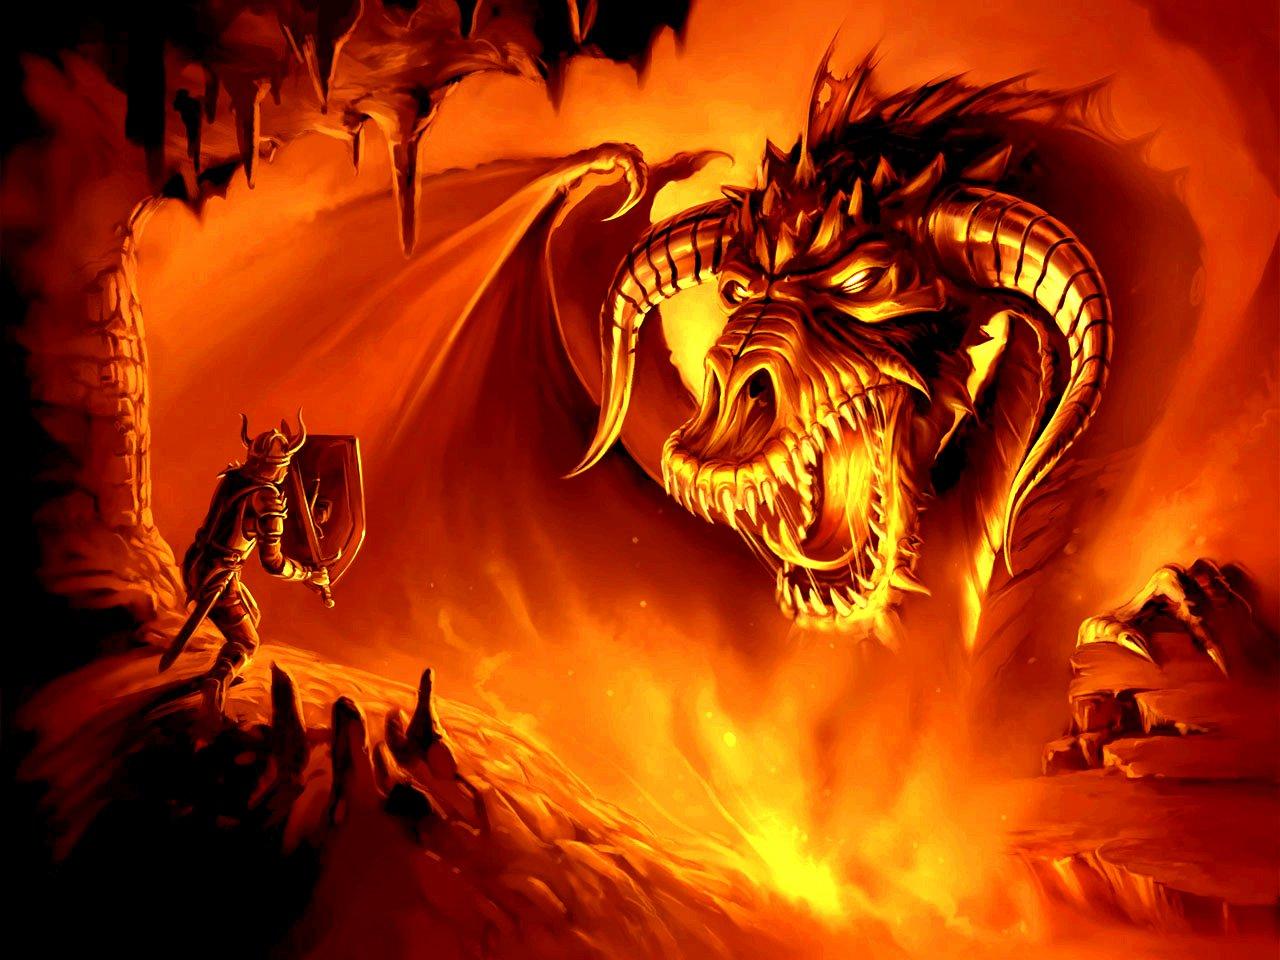 Magic-wallpapers - Warrior Fighting A Dragon - HD Wallpaper